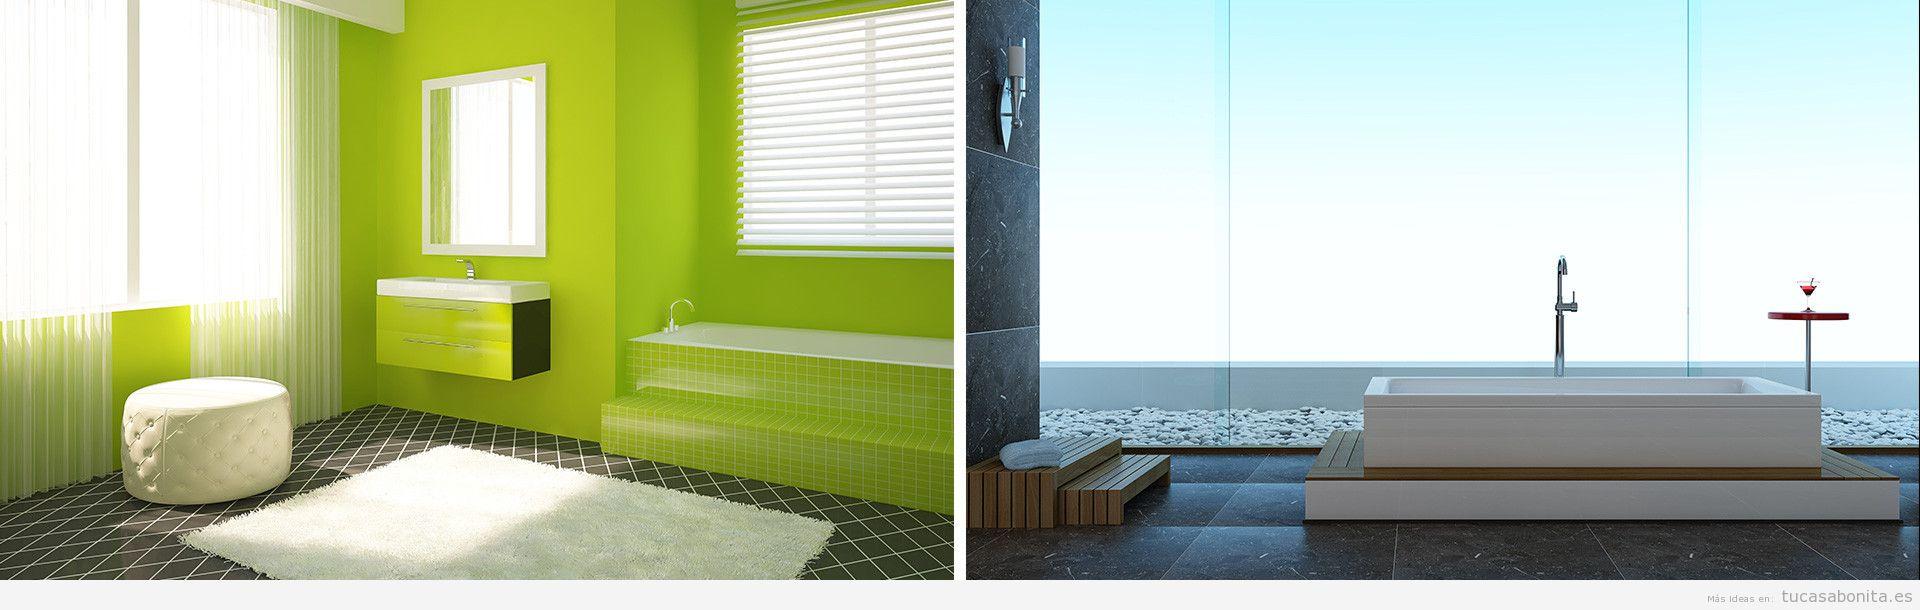 Lavabo tu casa bonita ideas para decorar pisos modernos - Banos ideas diseno ...